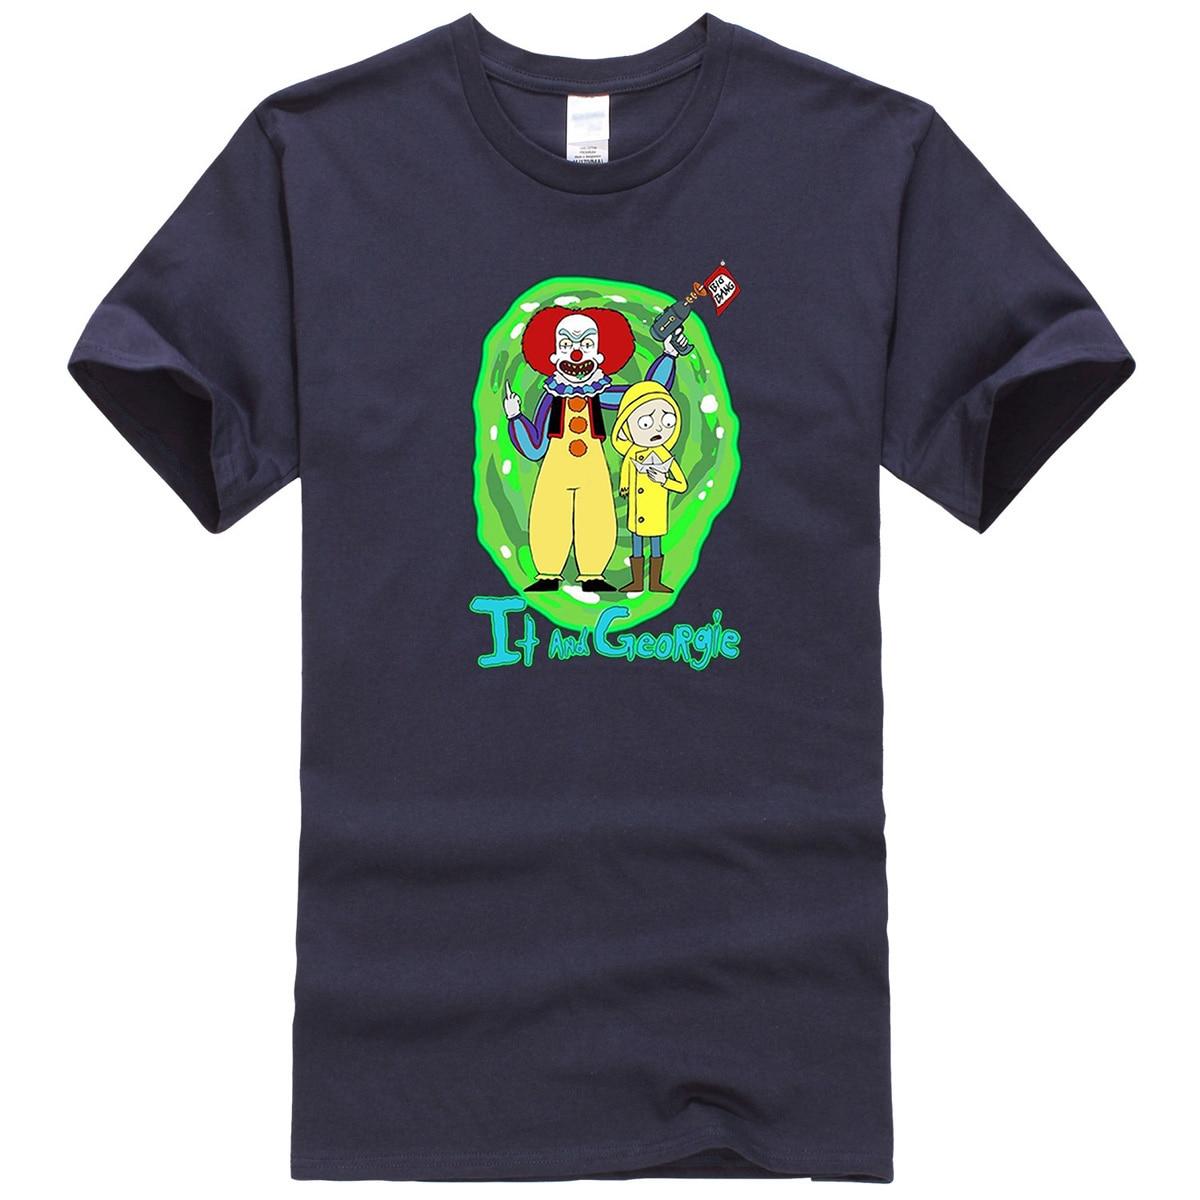 Rick And Morty Joker Funny Printed T Shirt Men Summer New 2020 Fashion Male Tops Casual Cartoon T-Shirt Hip Hop Cotton T-Shirts